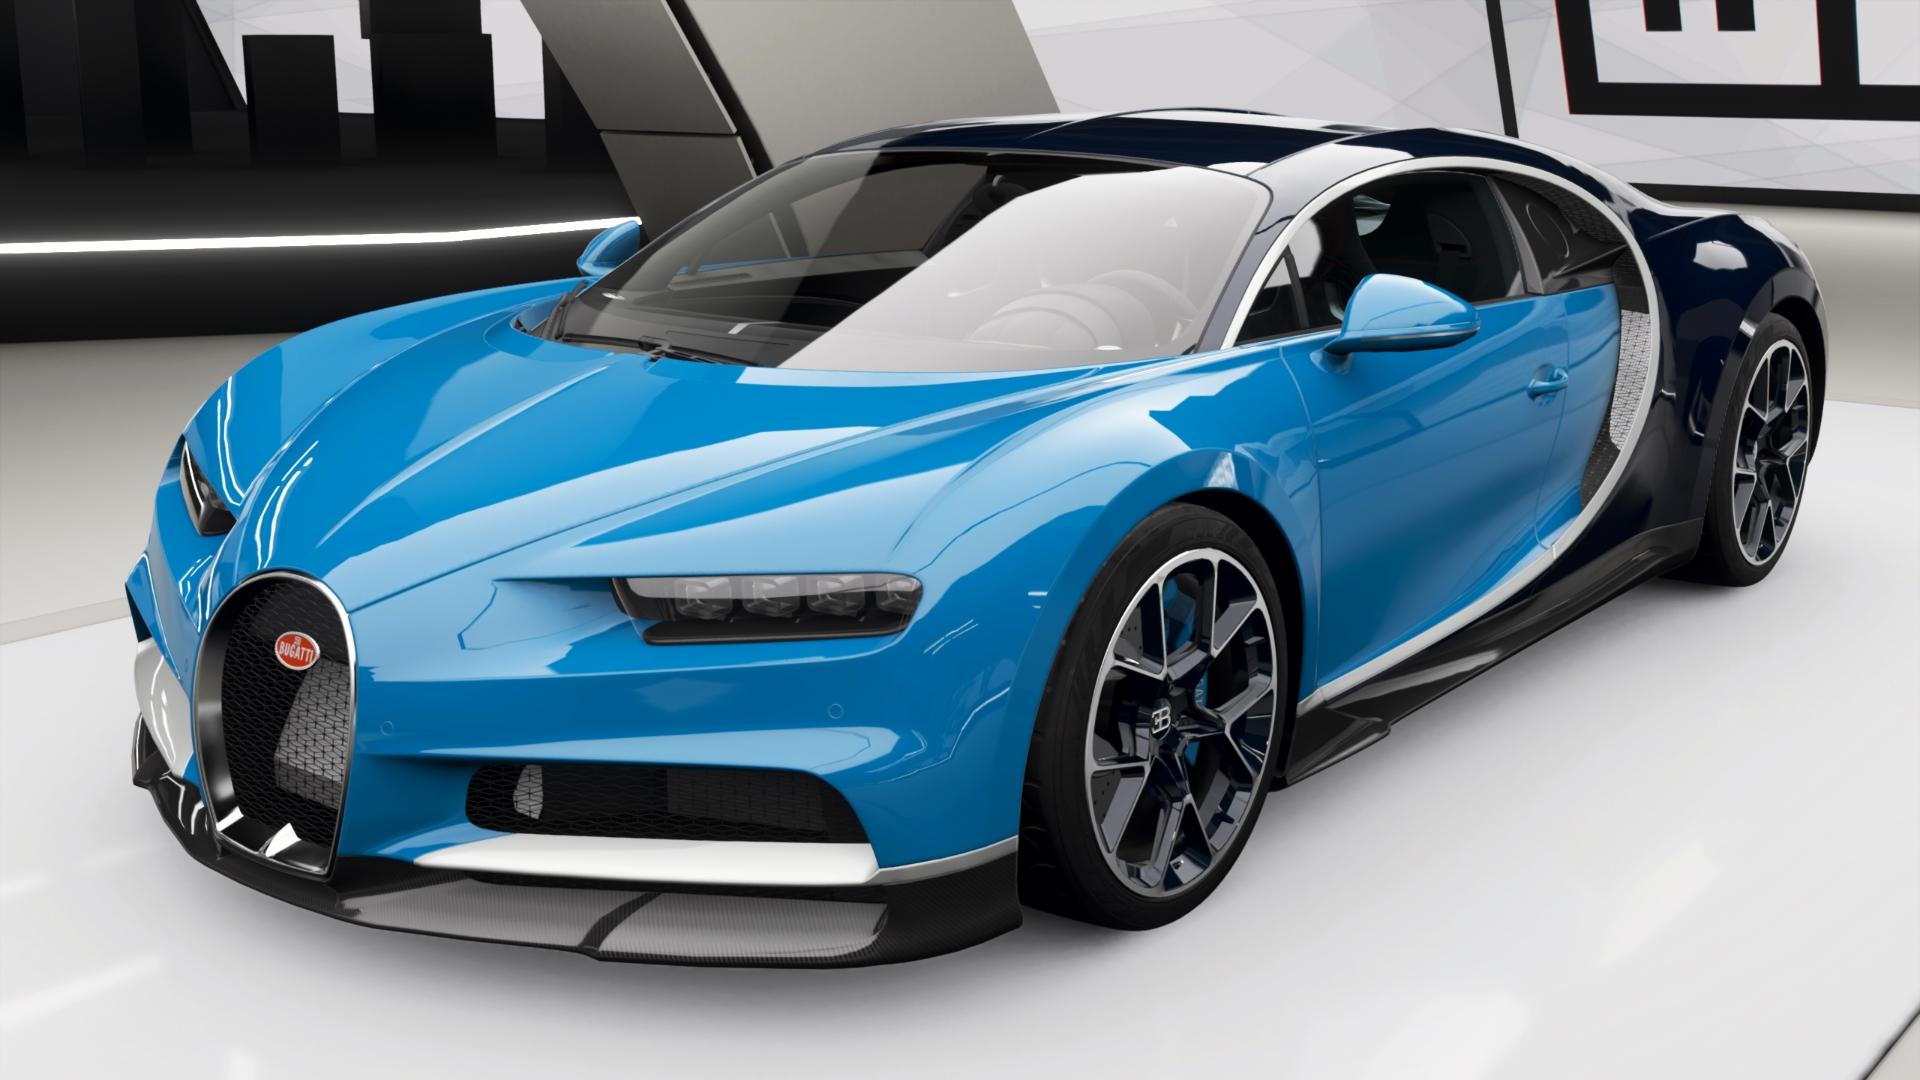 Bugatti Chiron   Forza Motorsport Wiki   FANDOM powered by Wikia